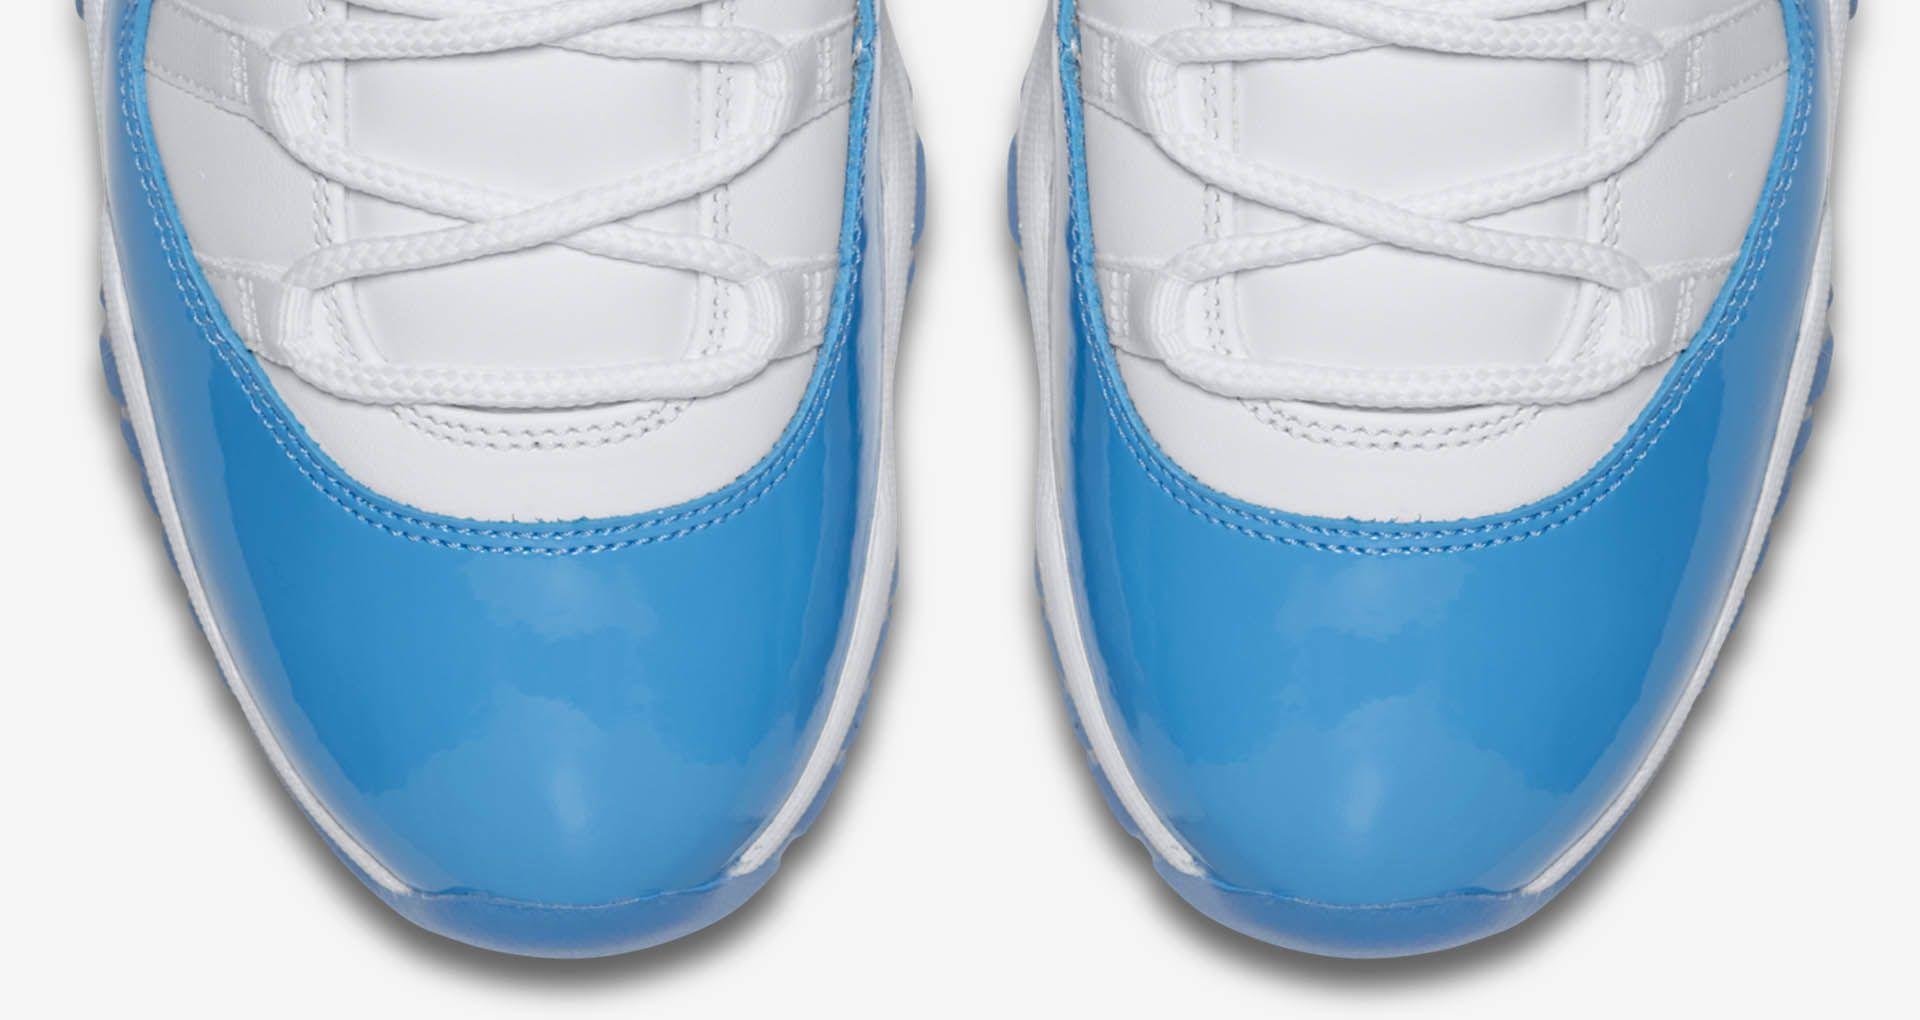 af432248b722f7 Air Jordan 11 Retro Low  White   University Blue . Nike+ SNKRS